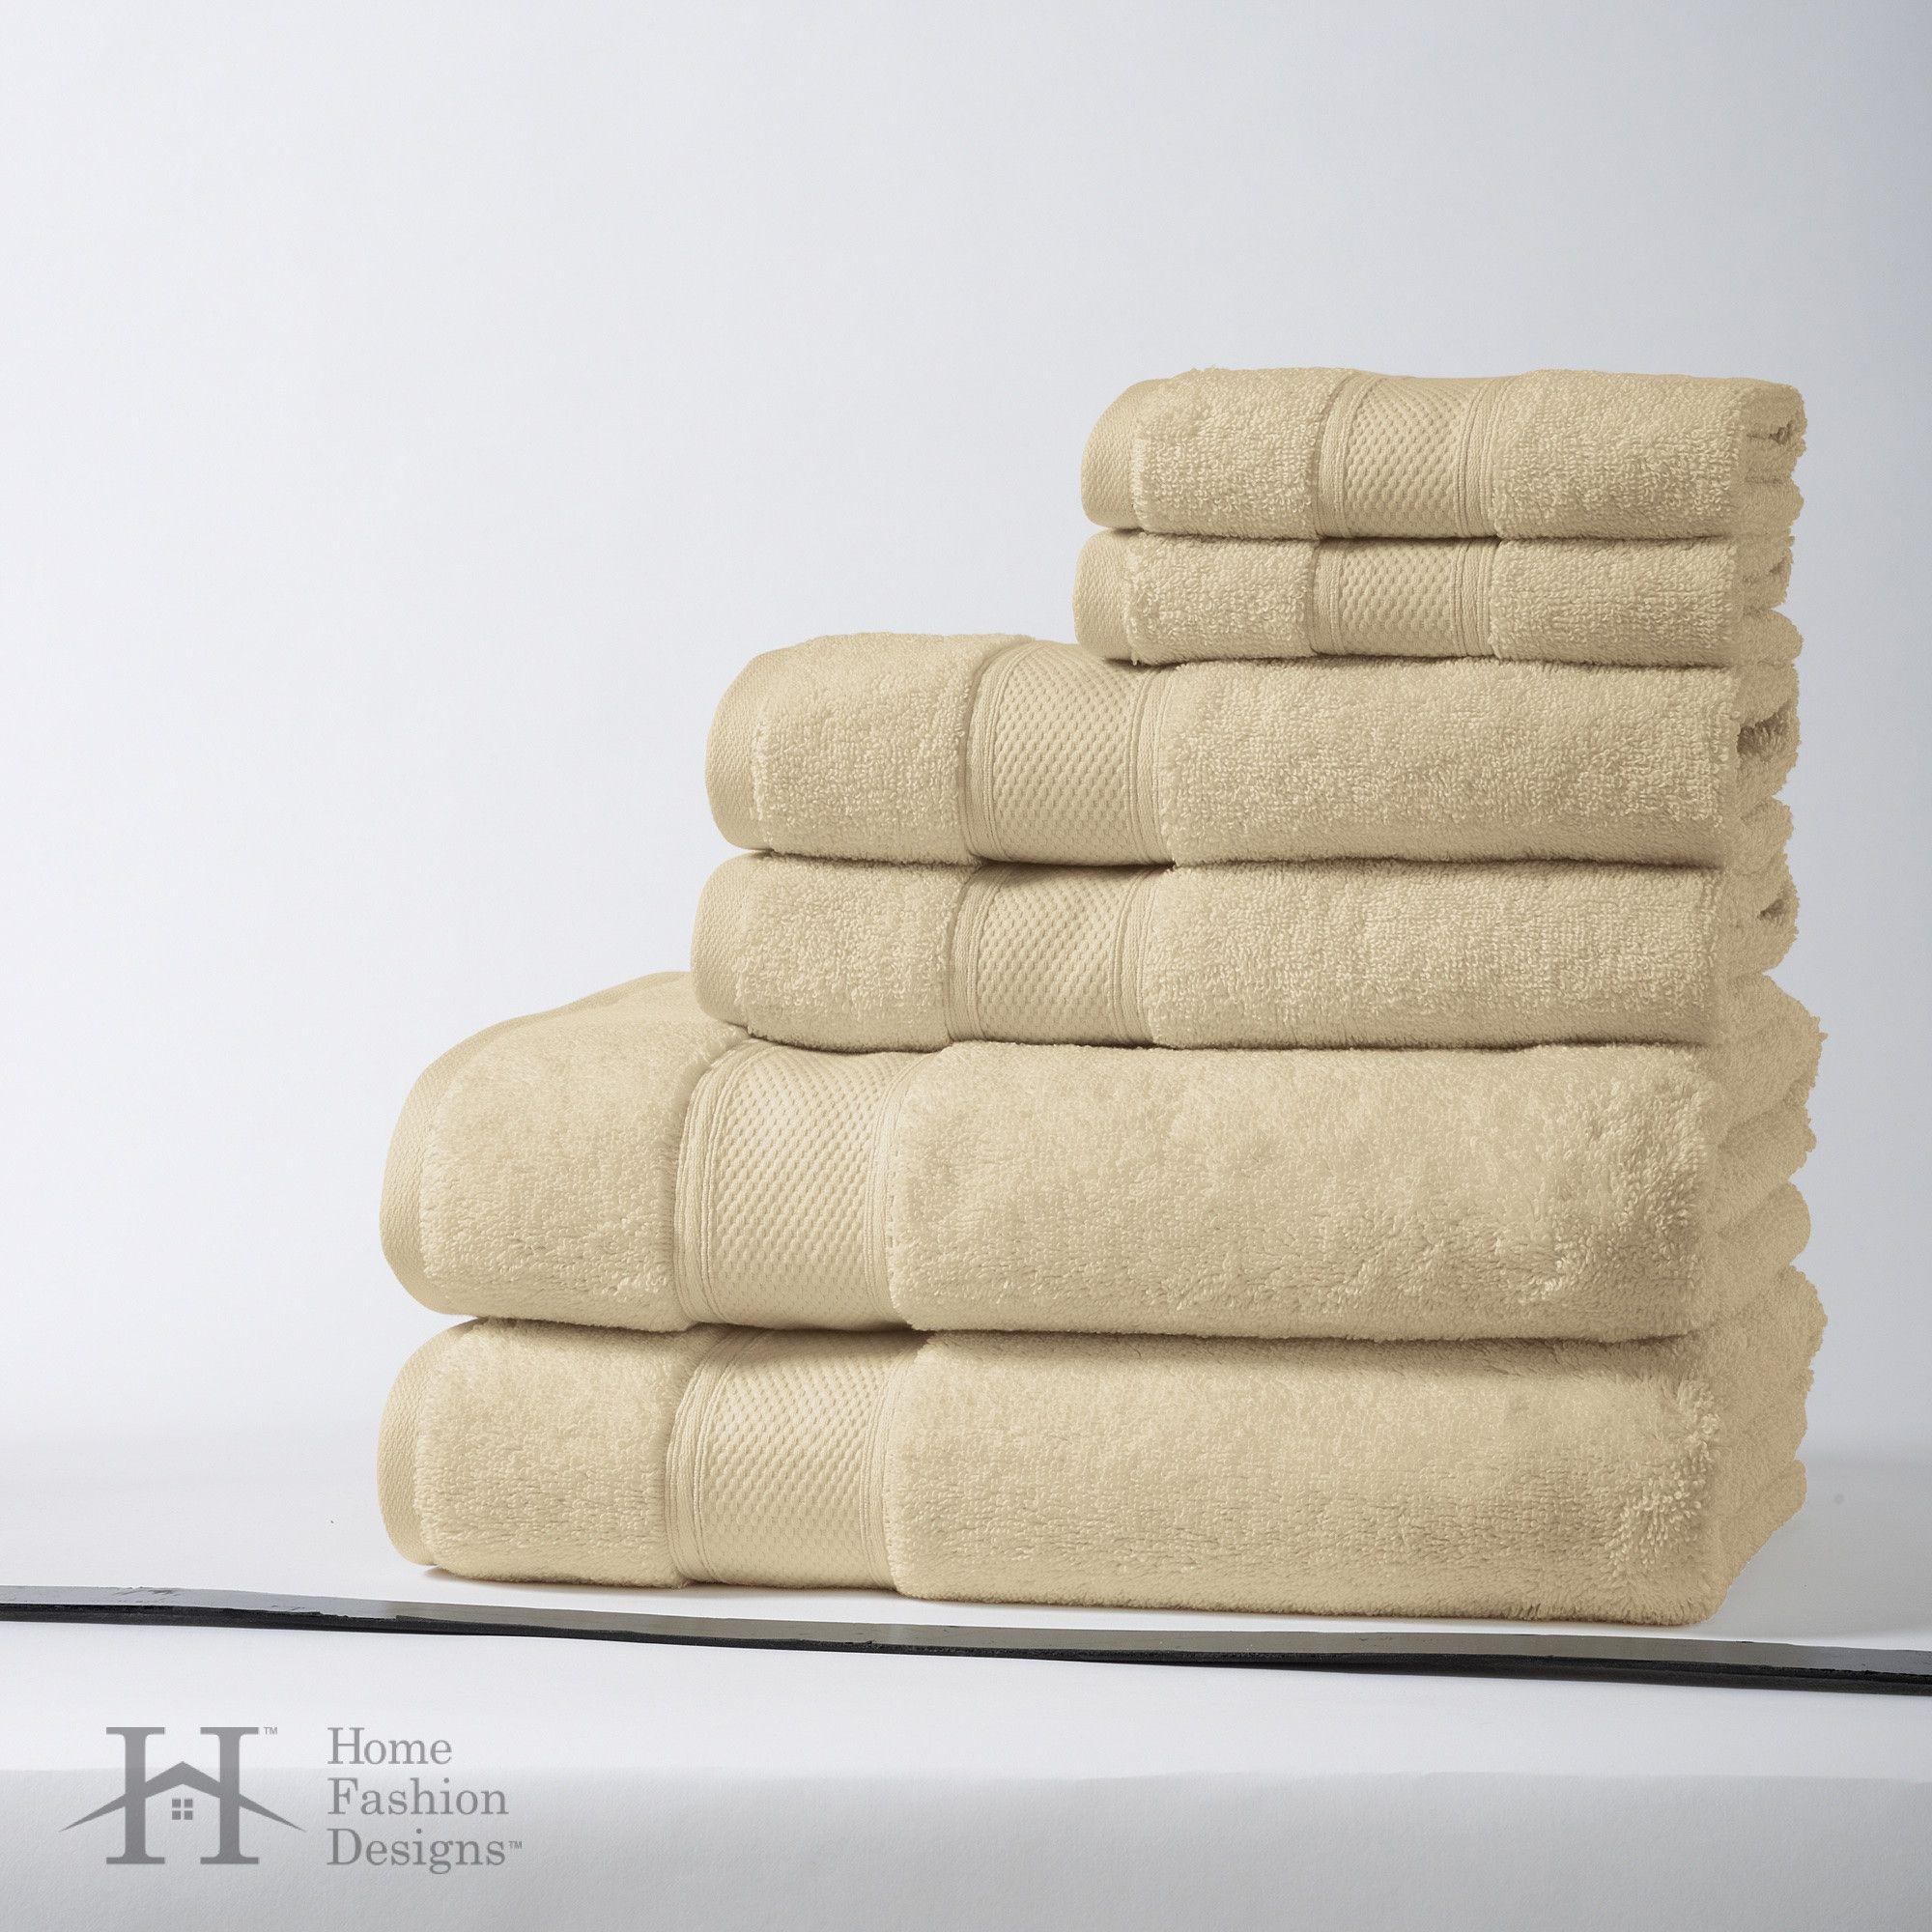 Santorini Collection 6-Piece Luxury 100% Turkish Cotton Towel Set